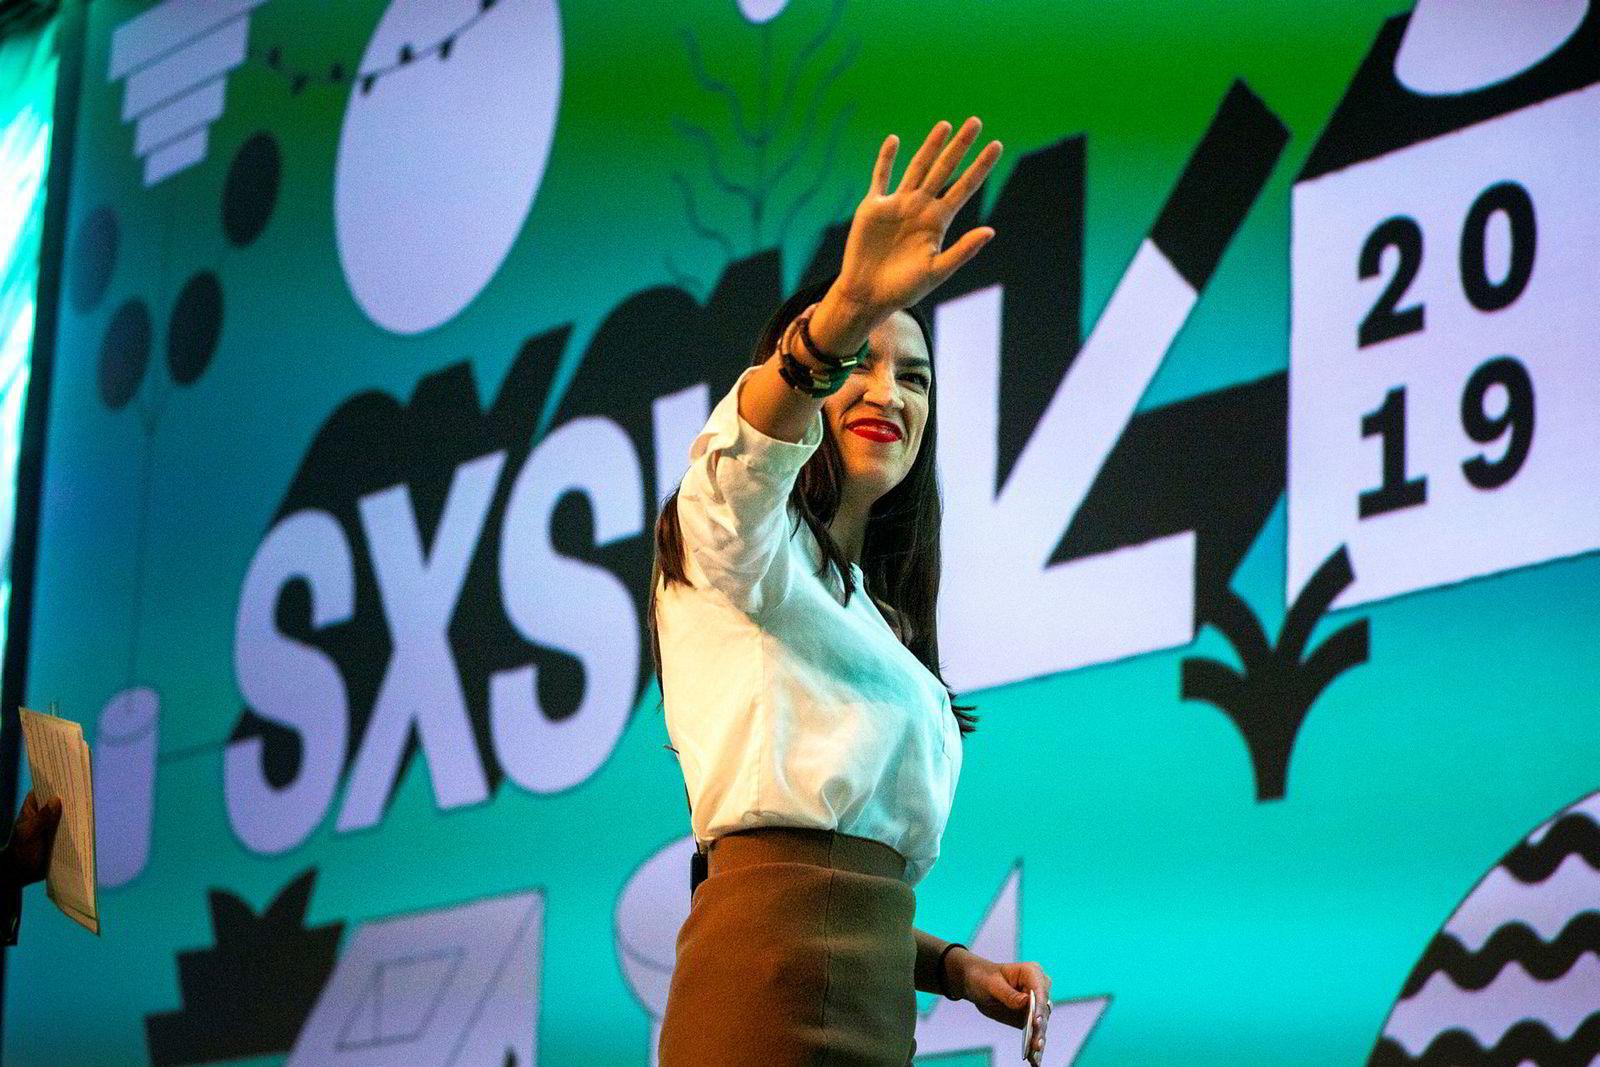 Alexandria Ocasio Cortez – kongressrepresentant fra Bronx i New York – besøkte Austin sist helg.